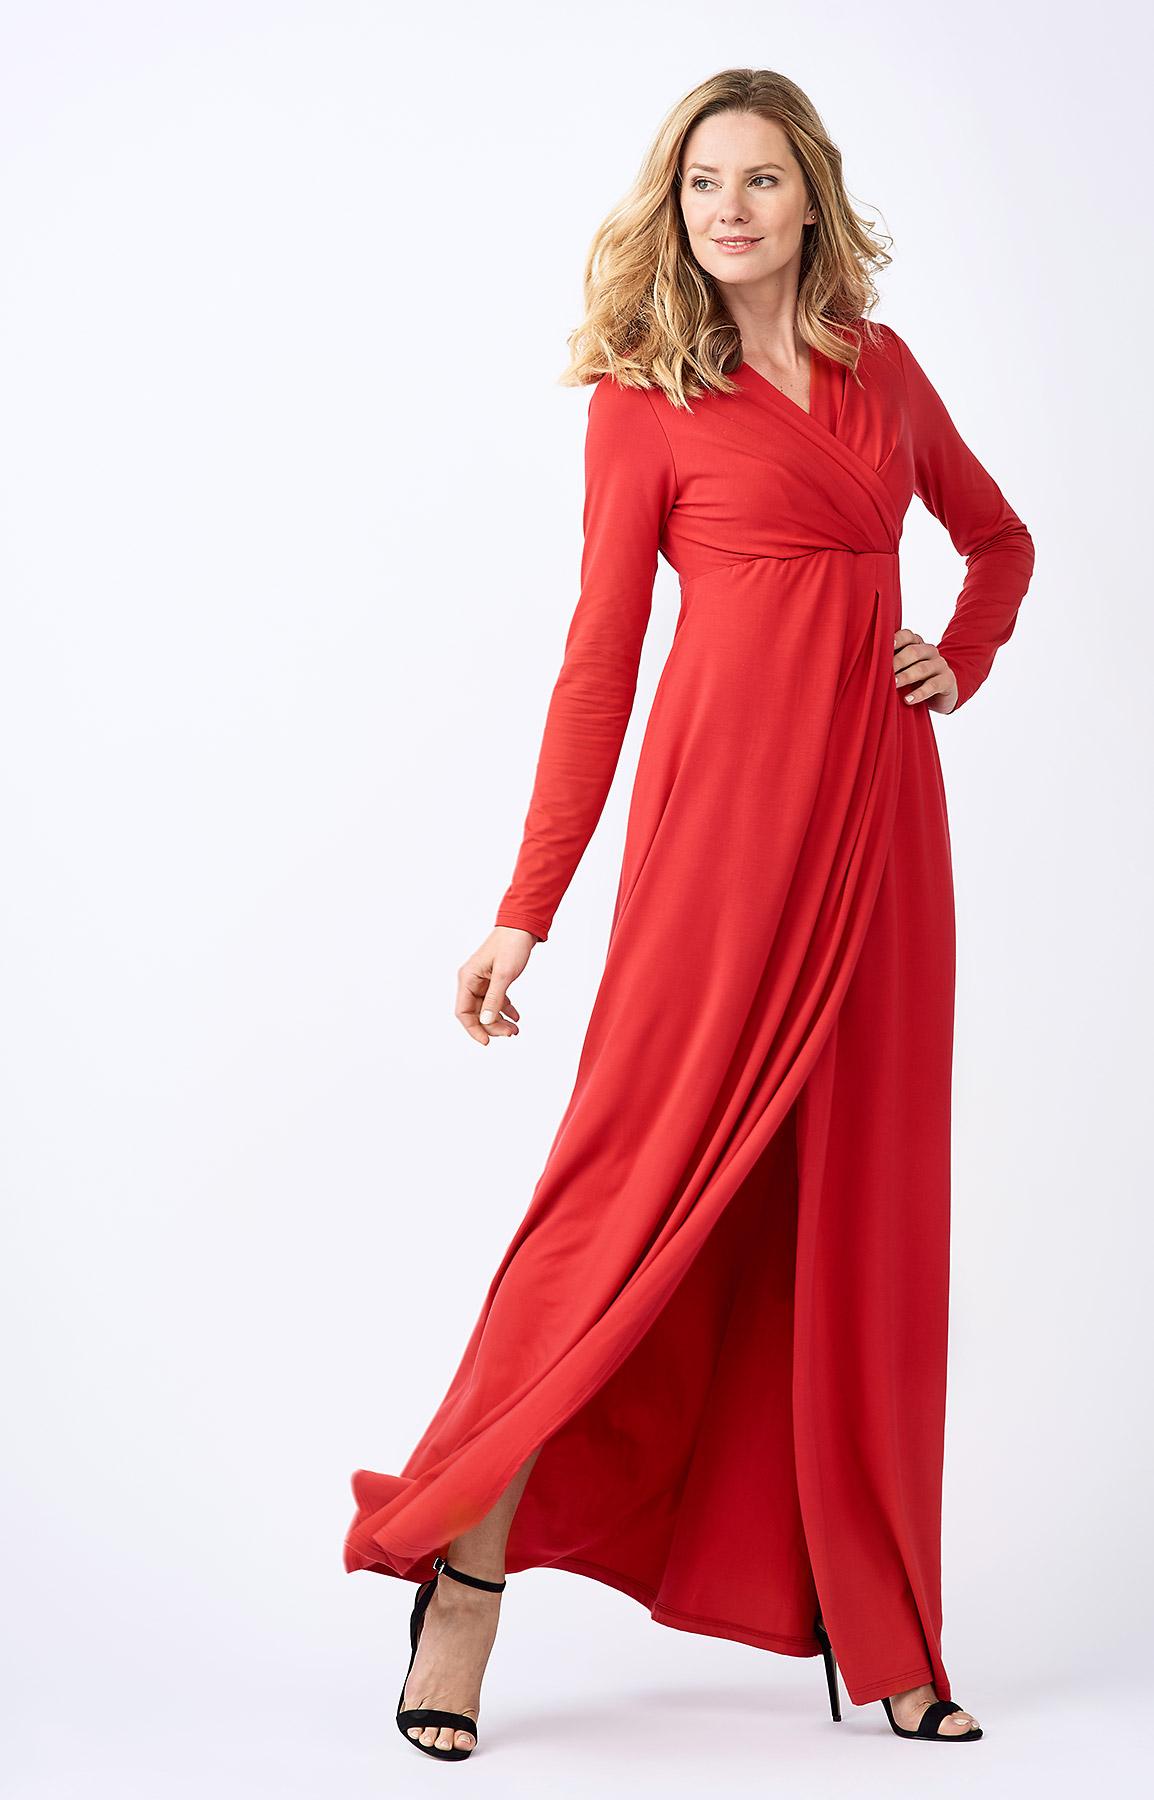 The Adélie Ayda dress in red